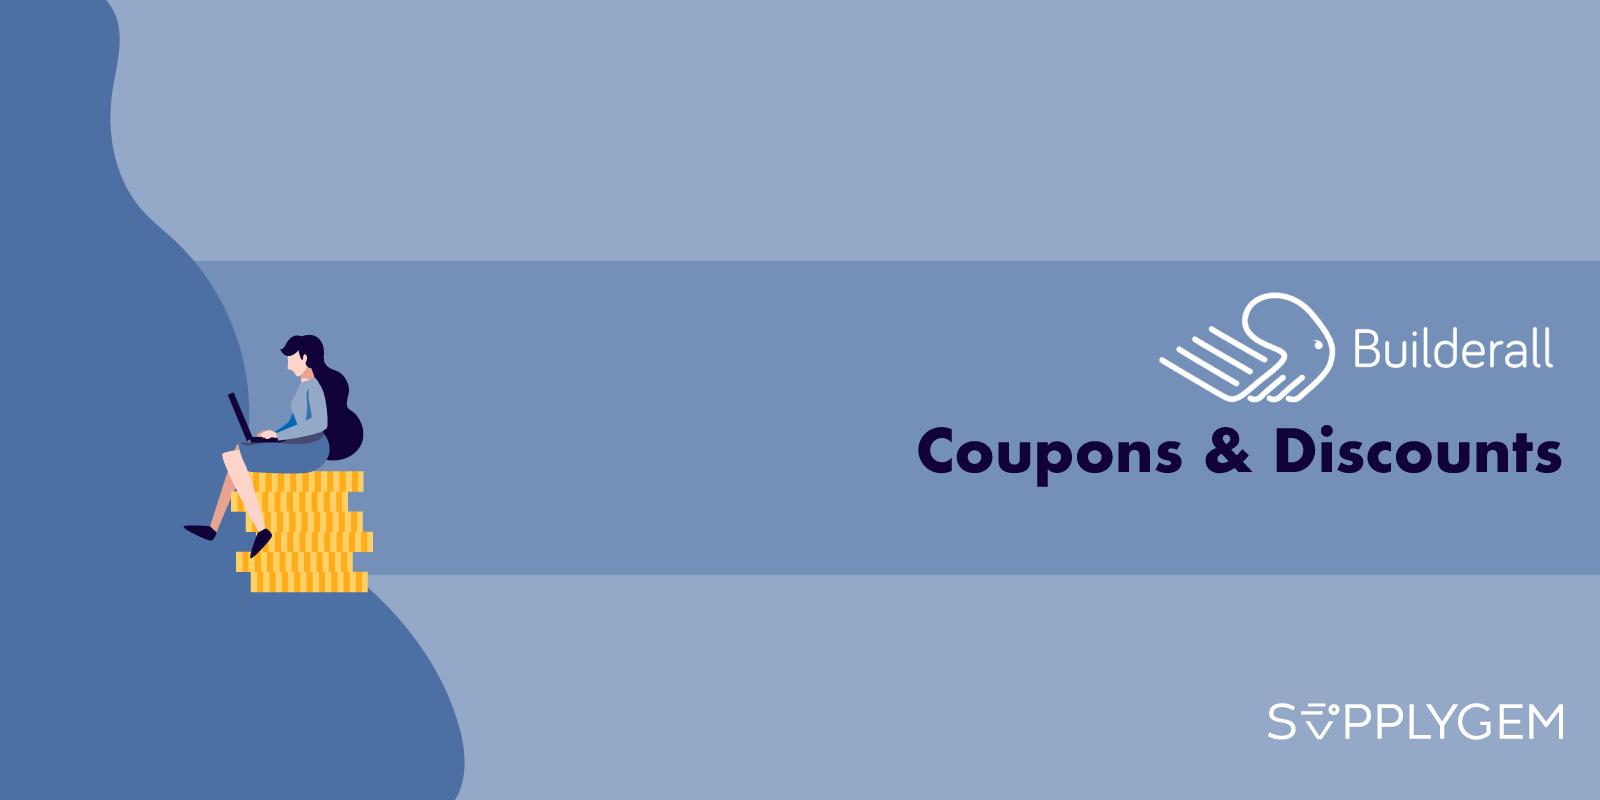 Builderall Coupons & Discounts